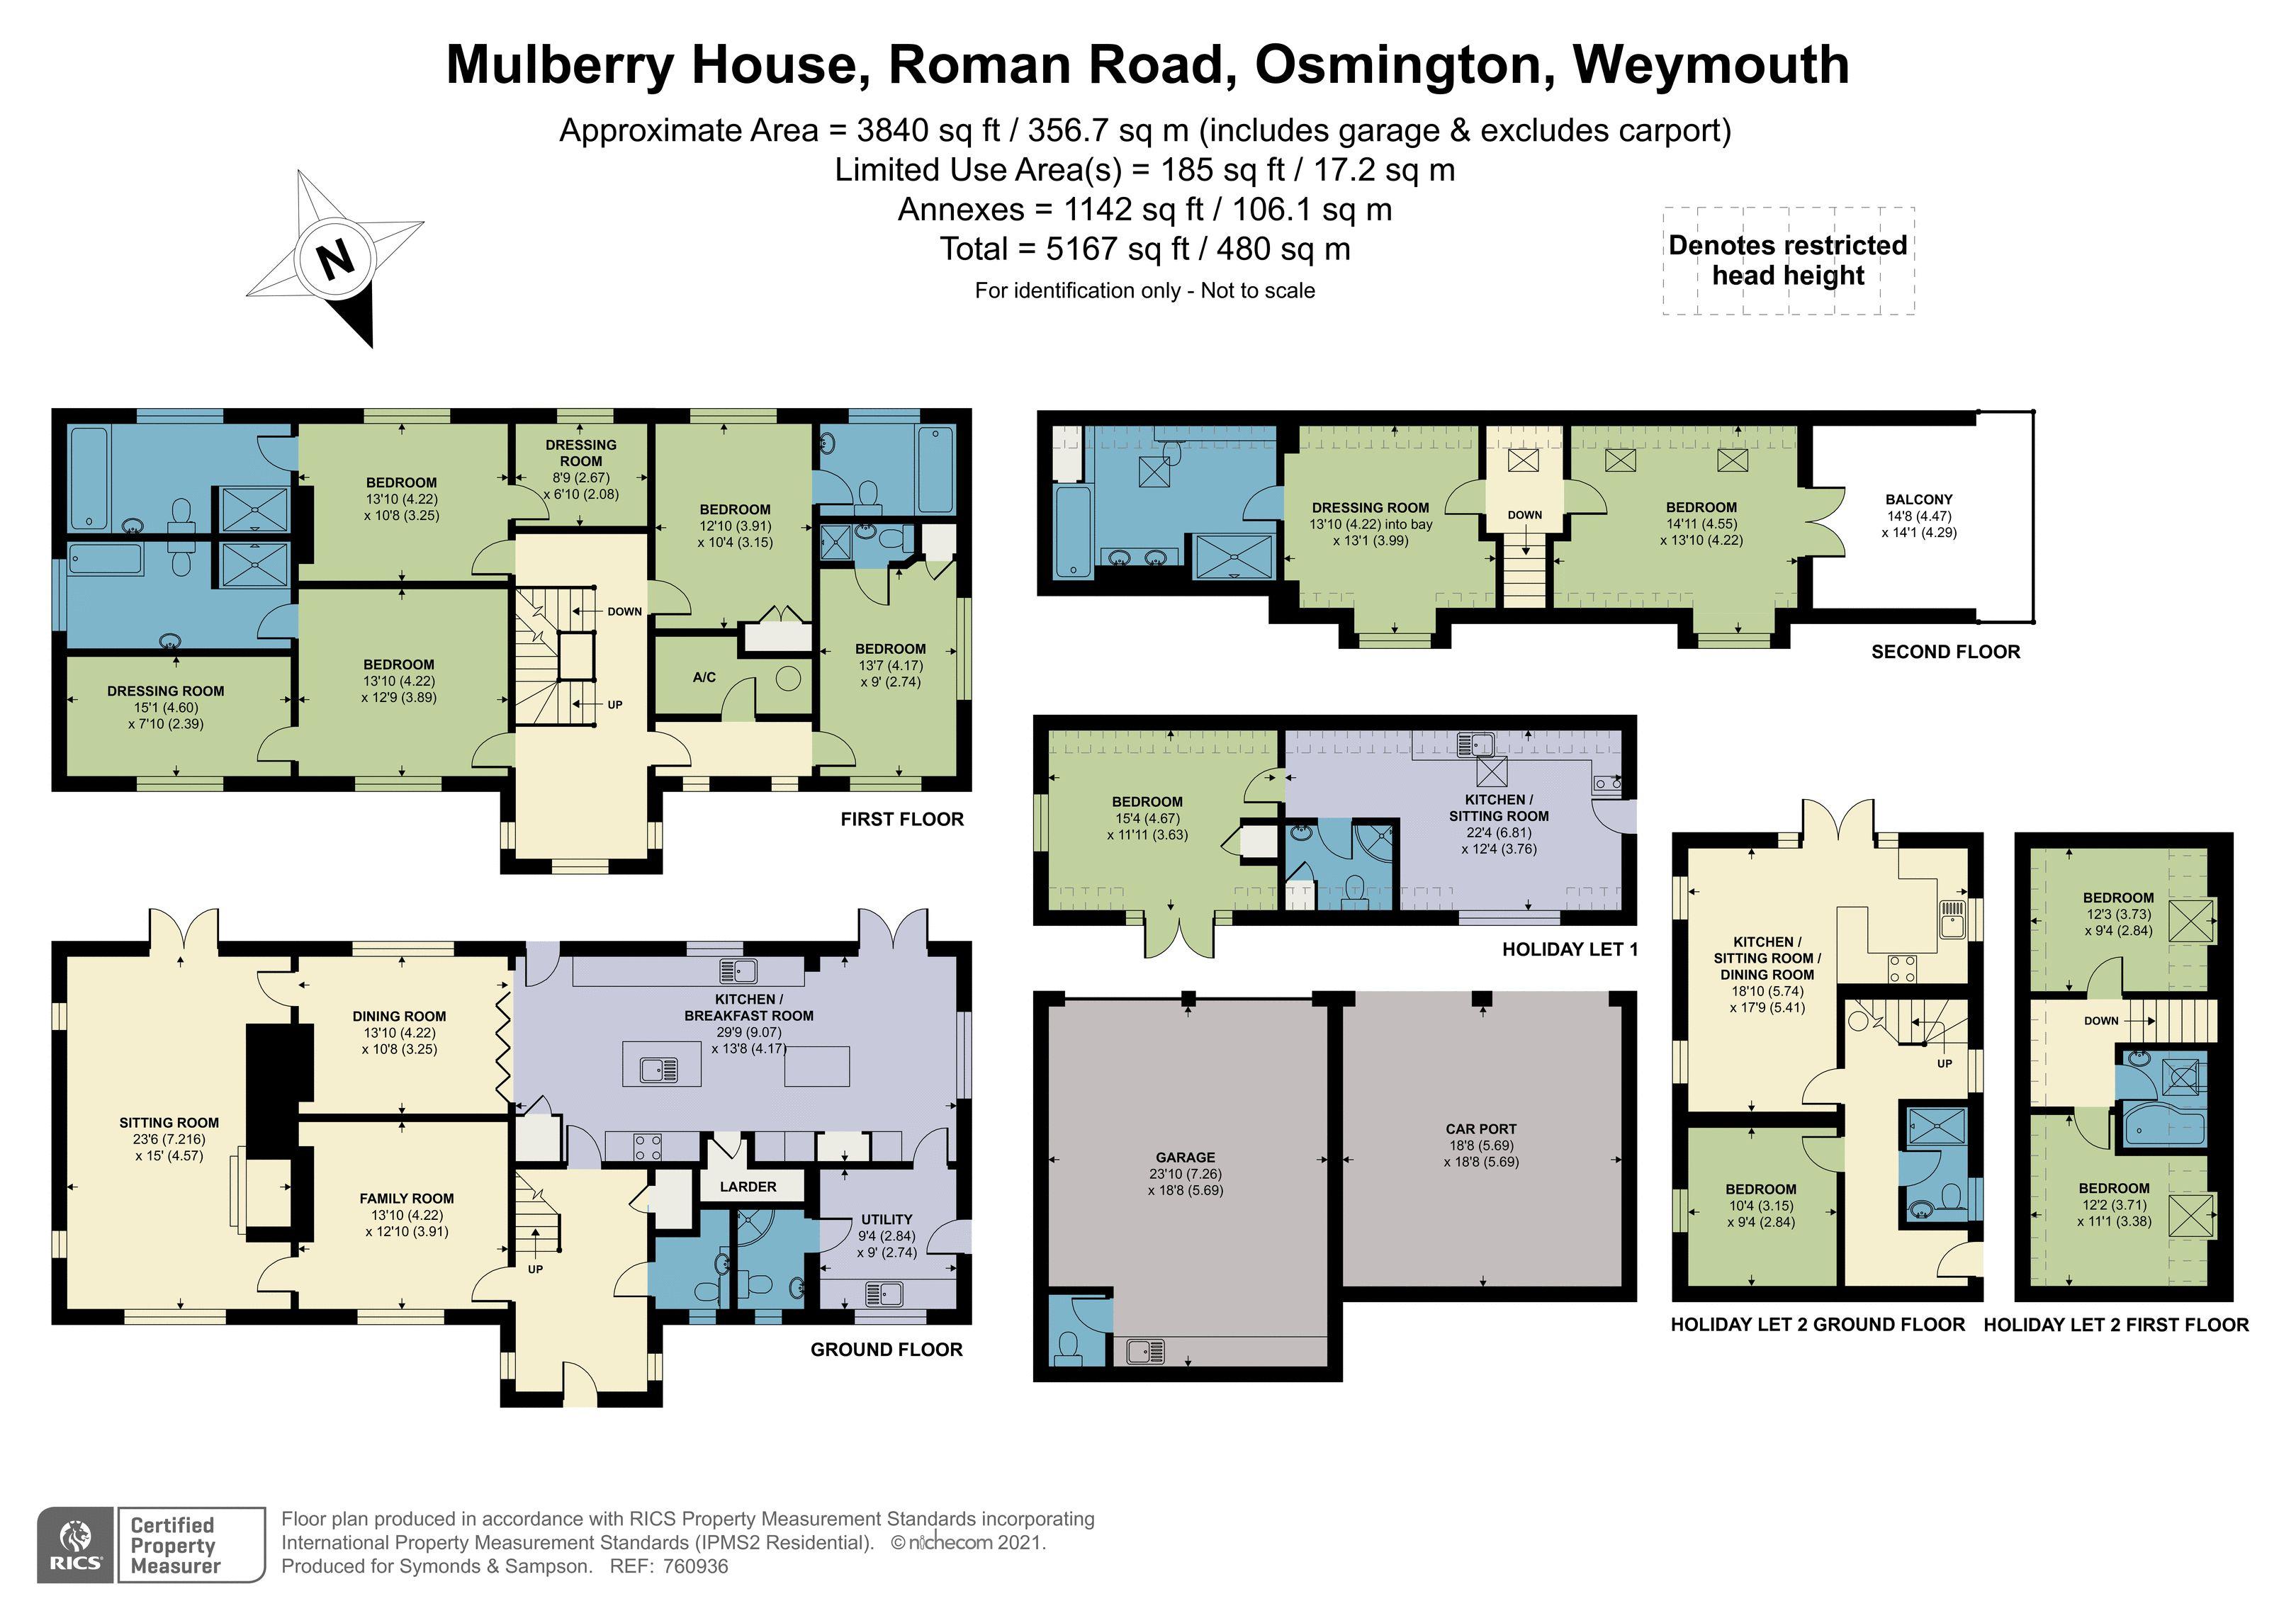 Floorplan - Roman Road, Osmington, Weymouth, Dorset, DT3 6ER